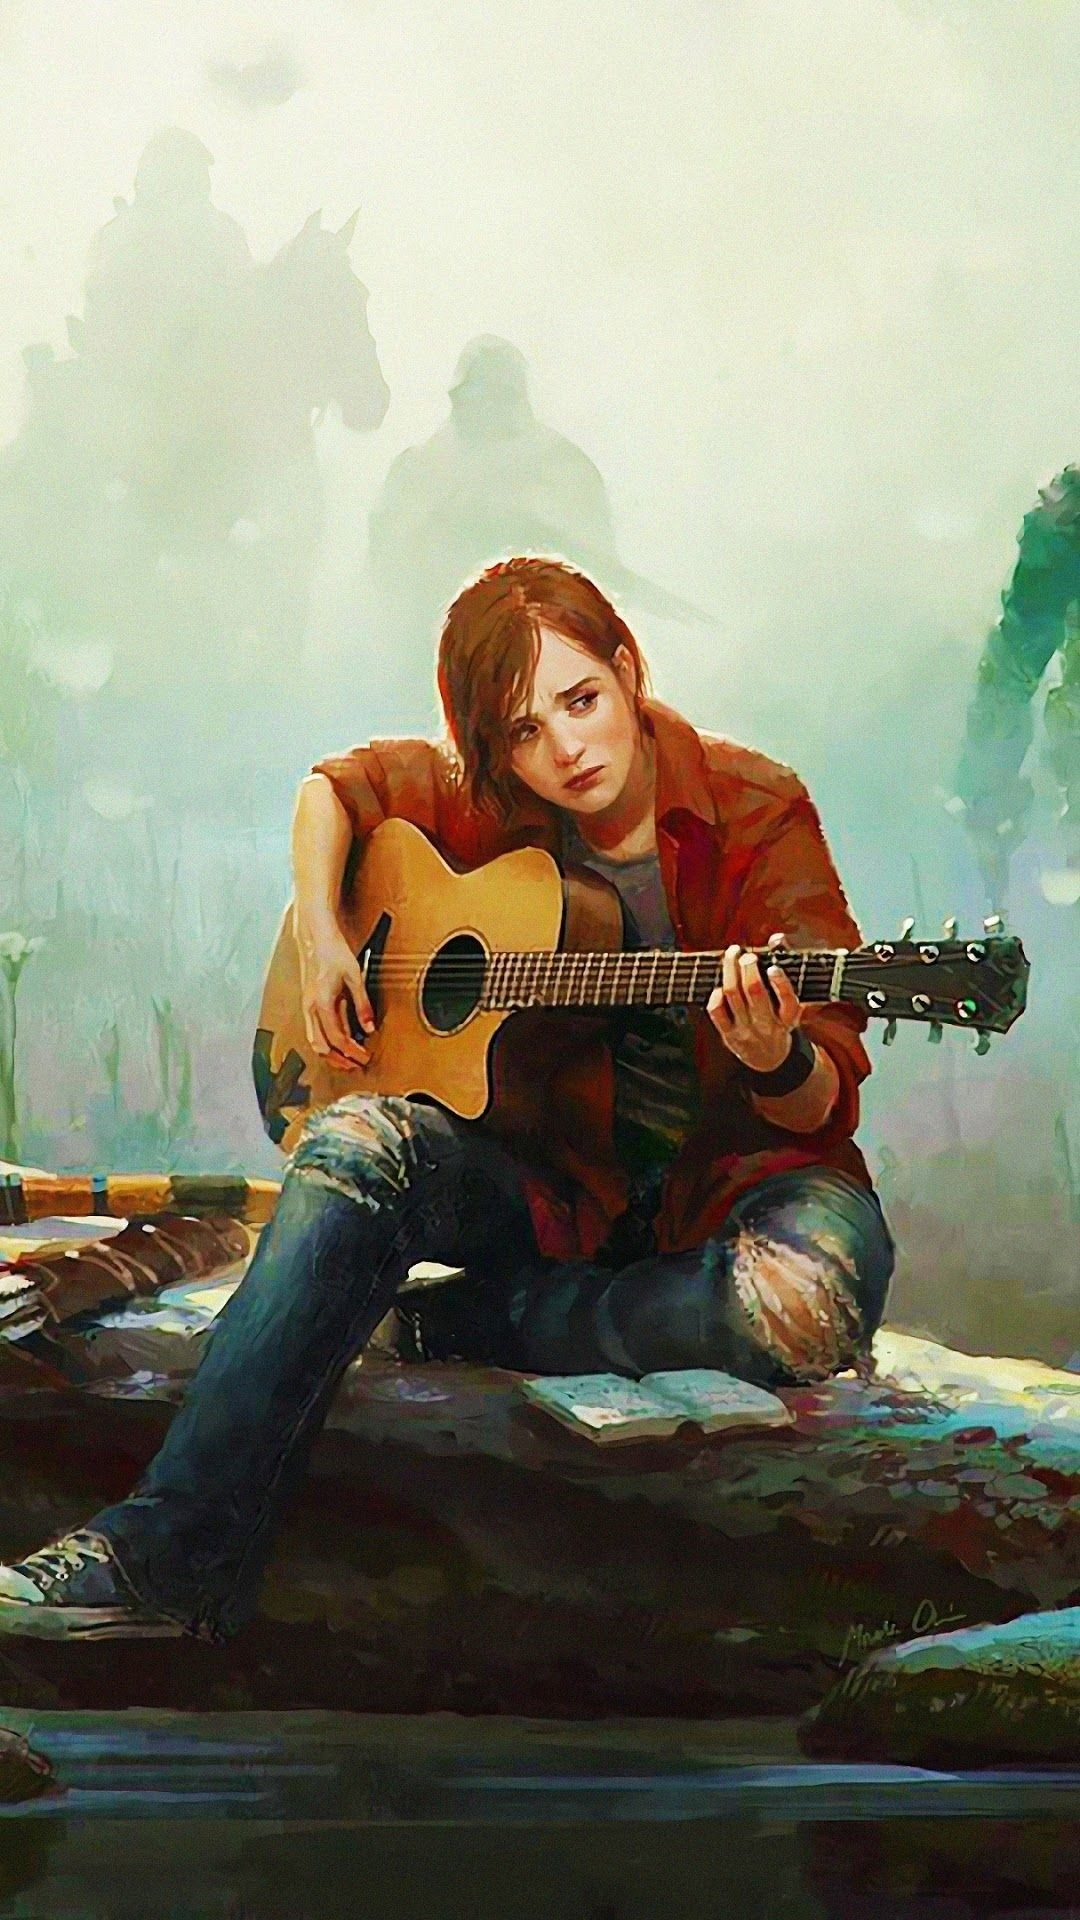 The Last Of Us iphone 8 plus wallpaper